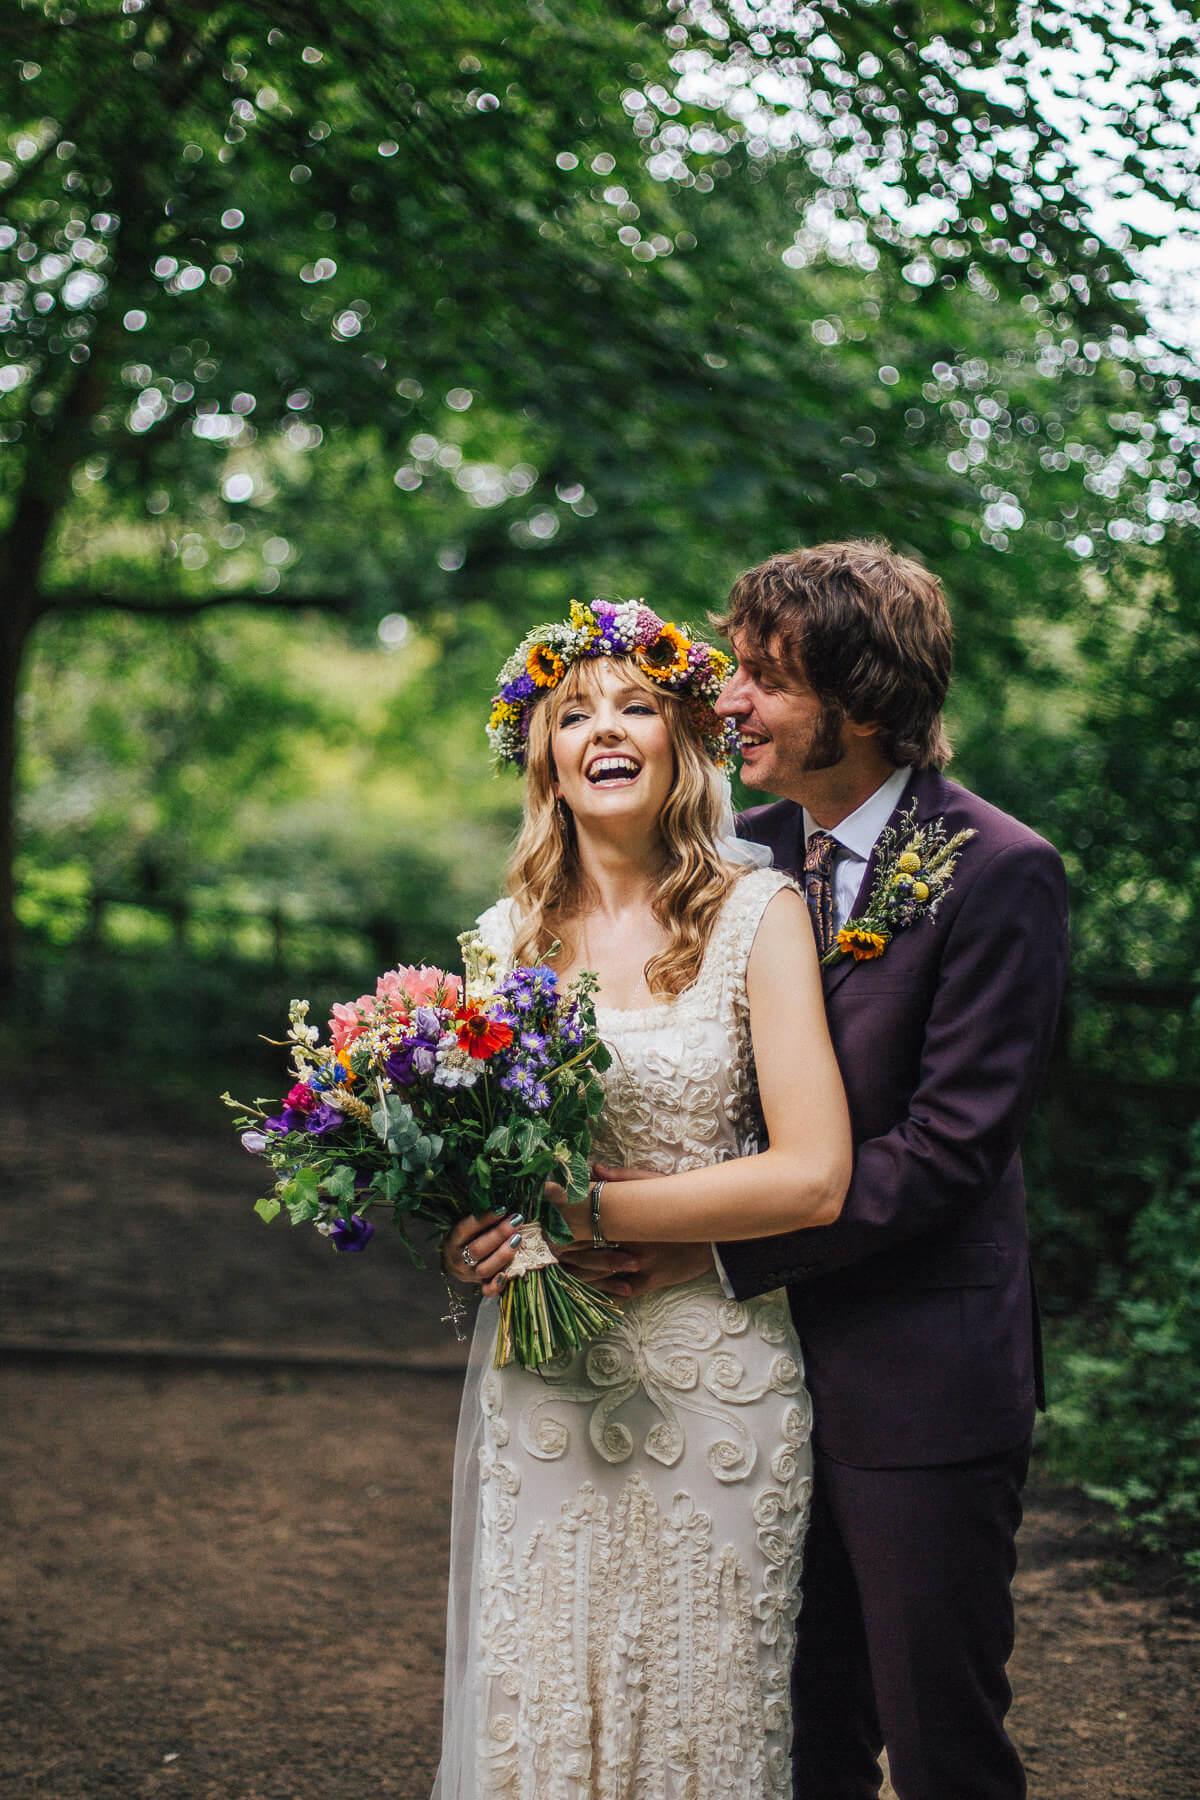 Boho bride wearing a sunflower flower crown